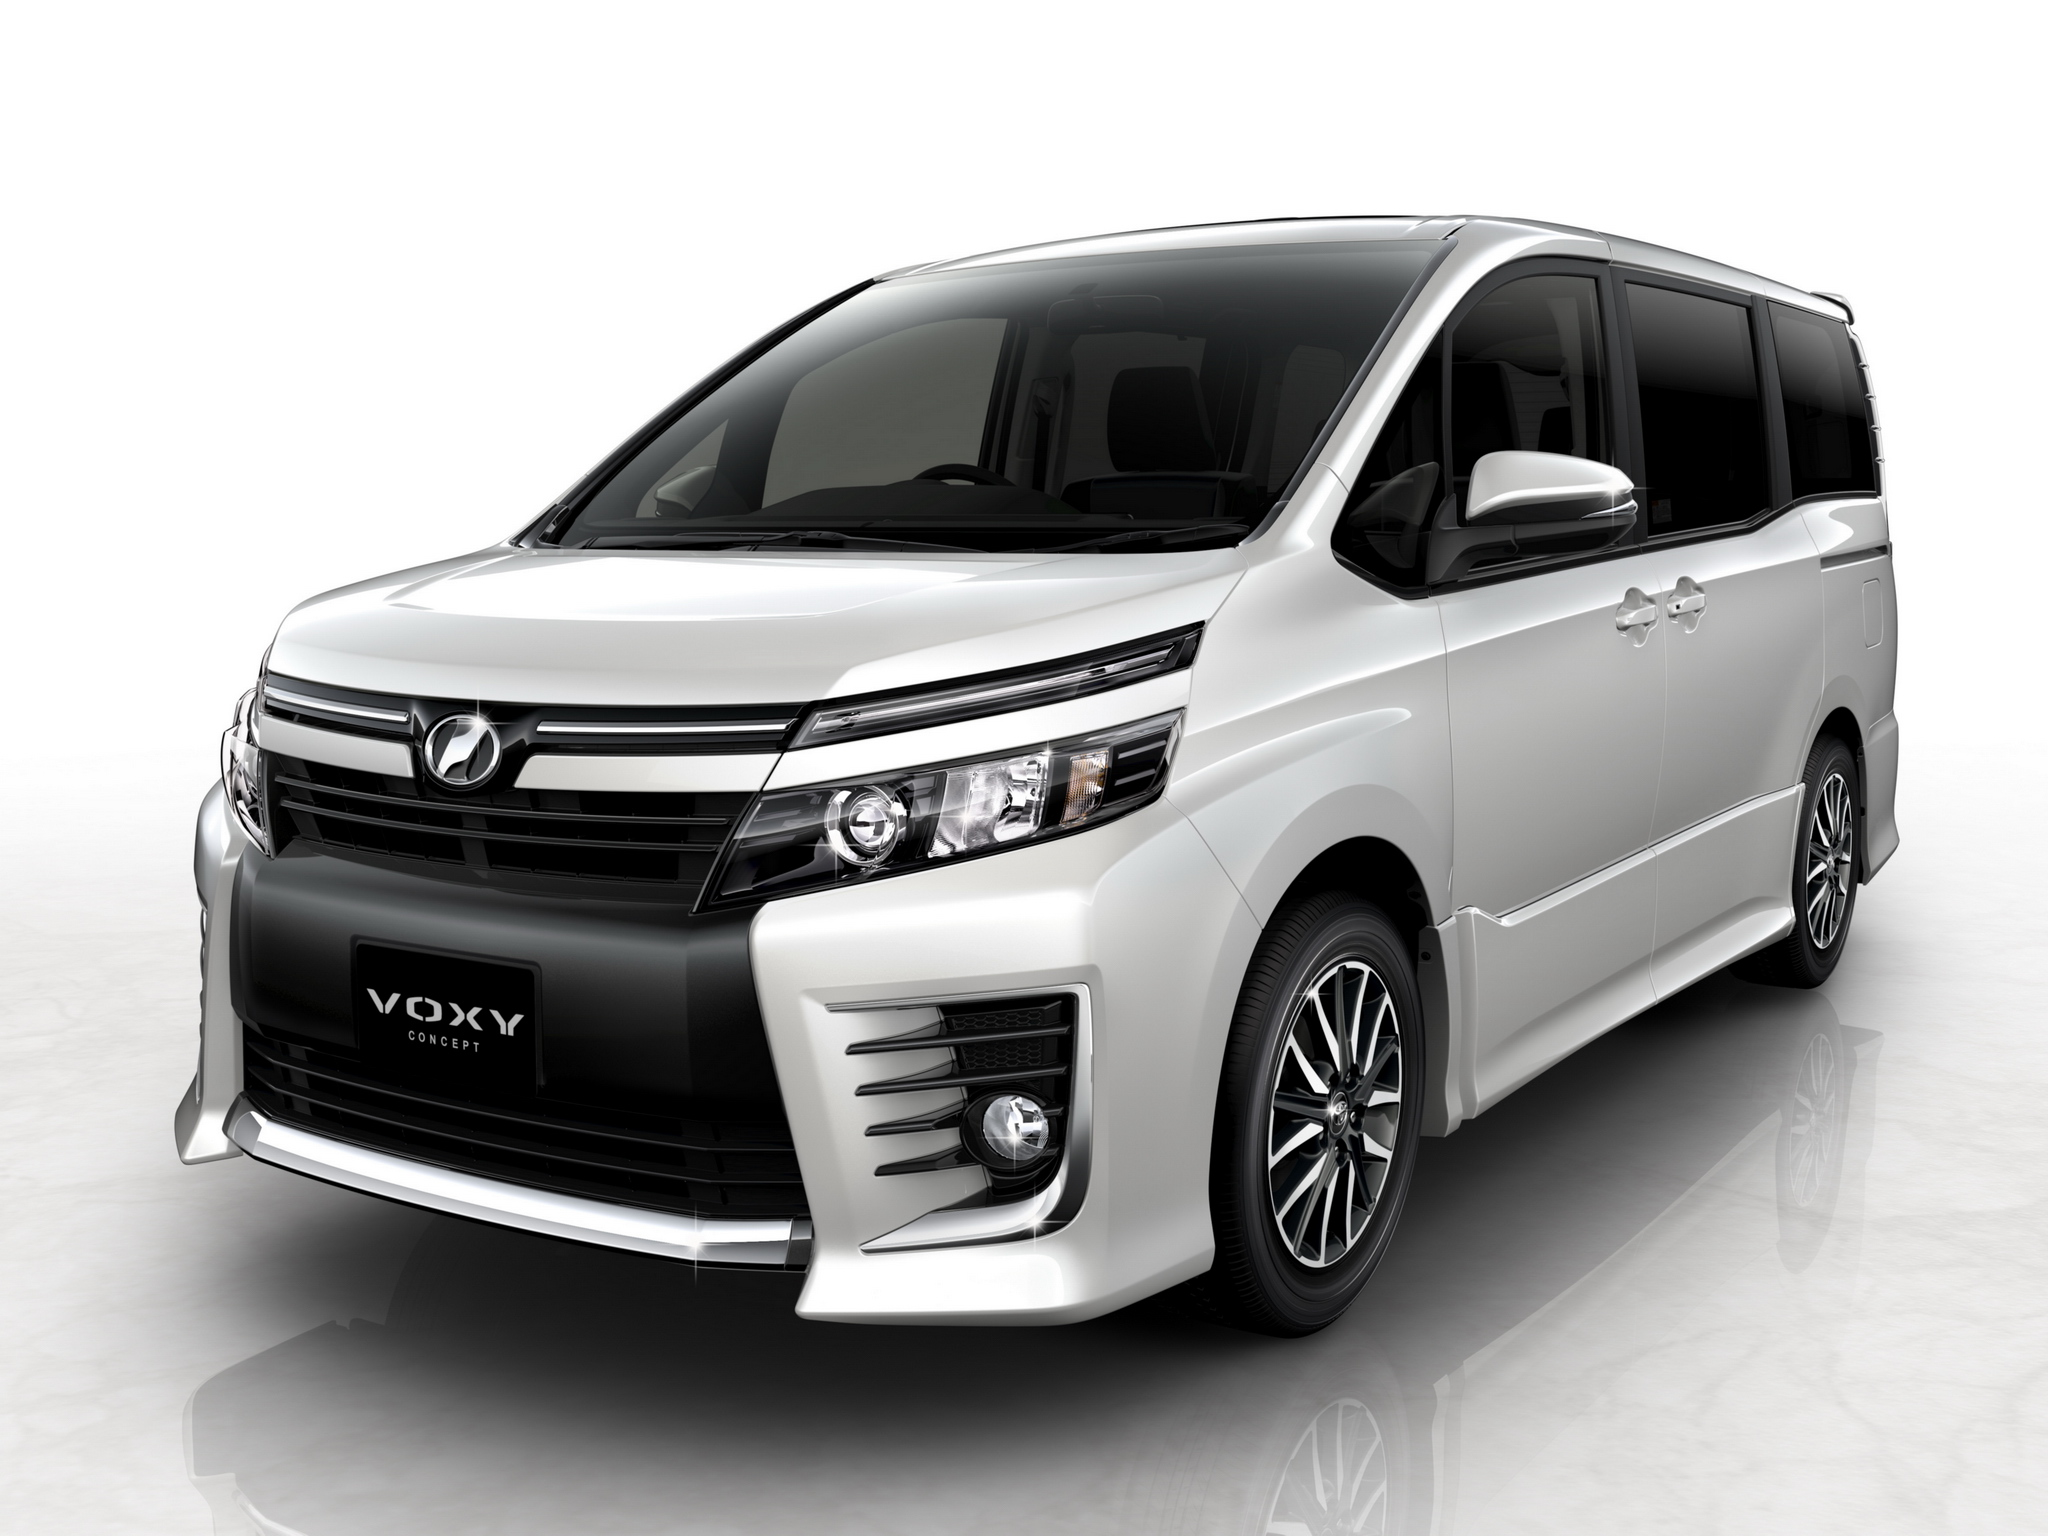 Toyota Voxy Concept Suv Van F Wallpaper